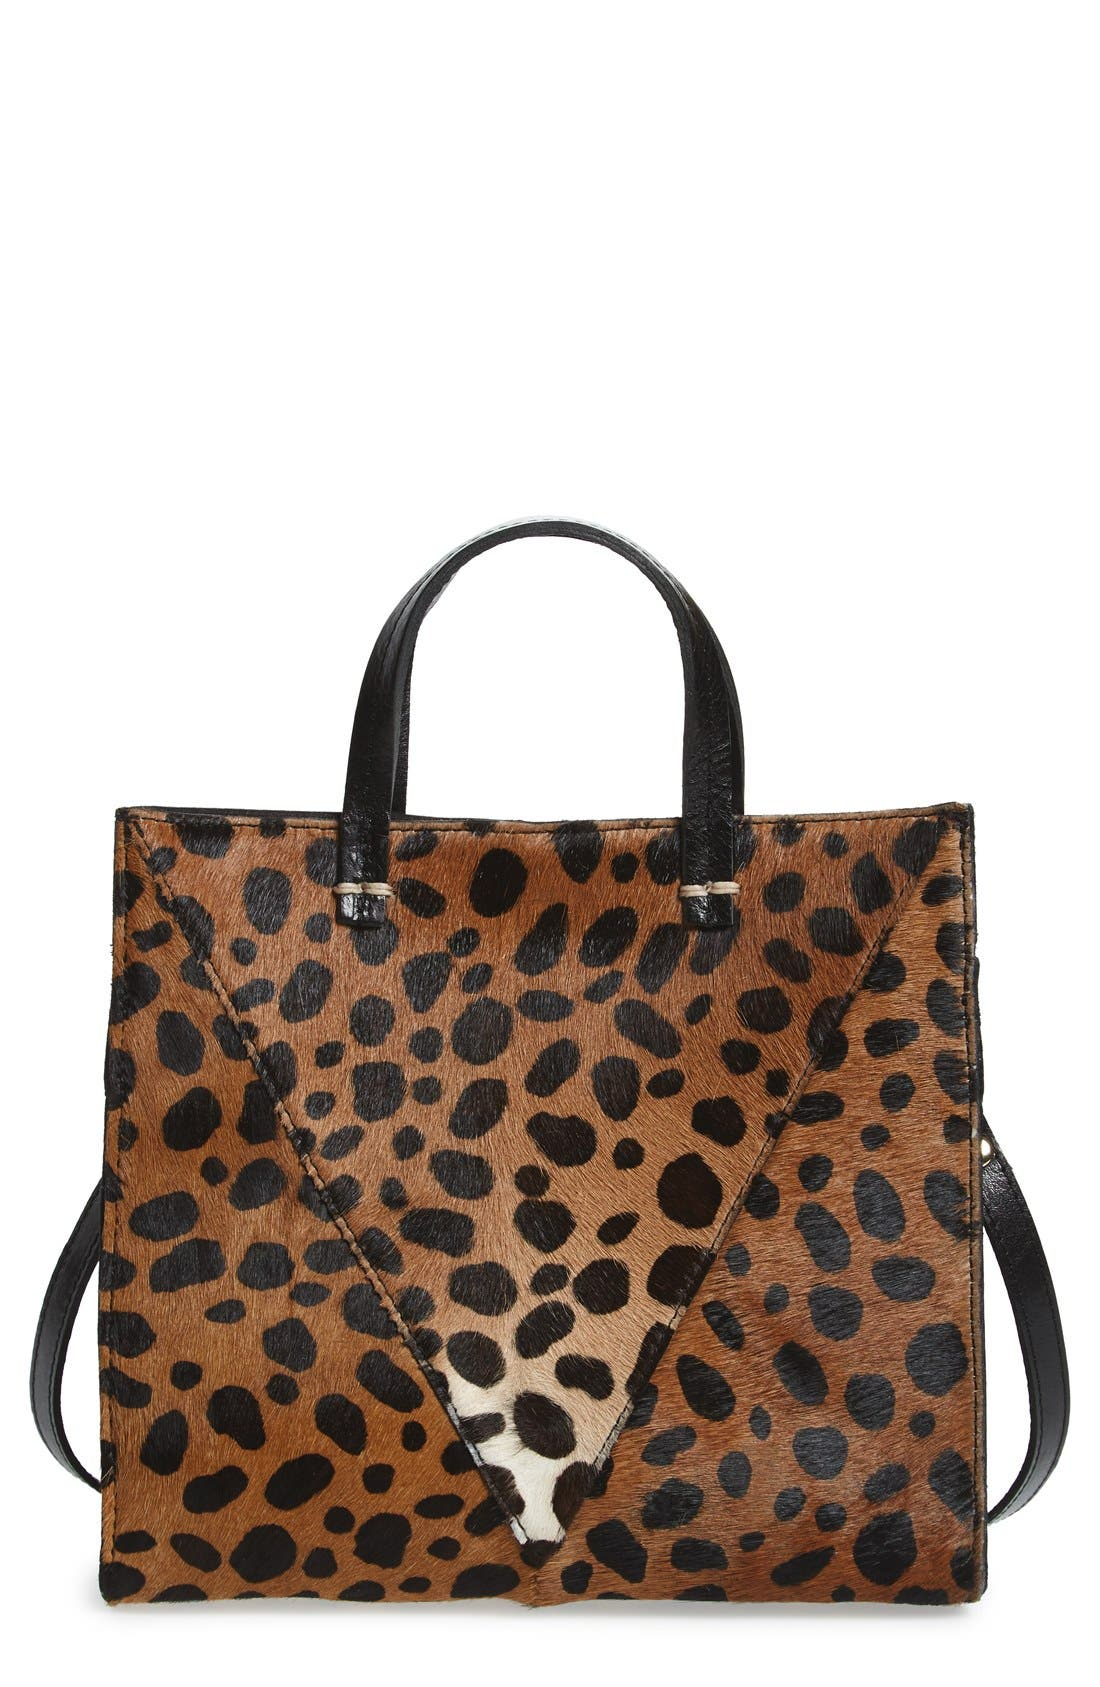 Clare V. 'Petit Simple' Leopard Print Genuine Calf Hair Tote